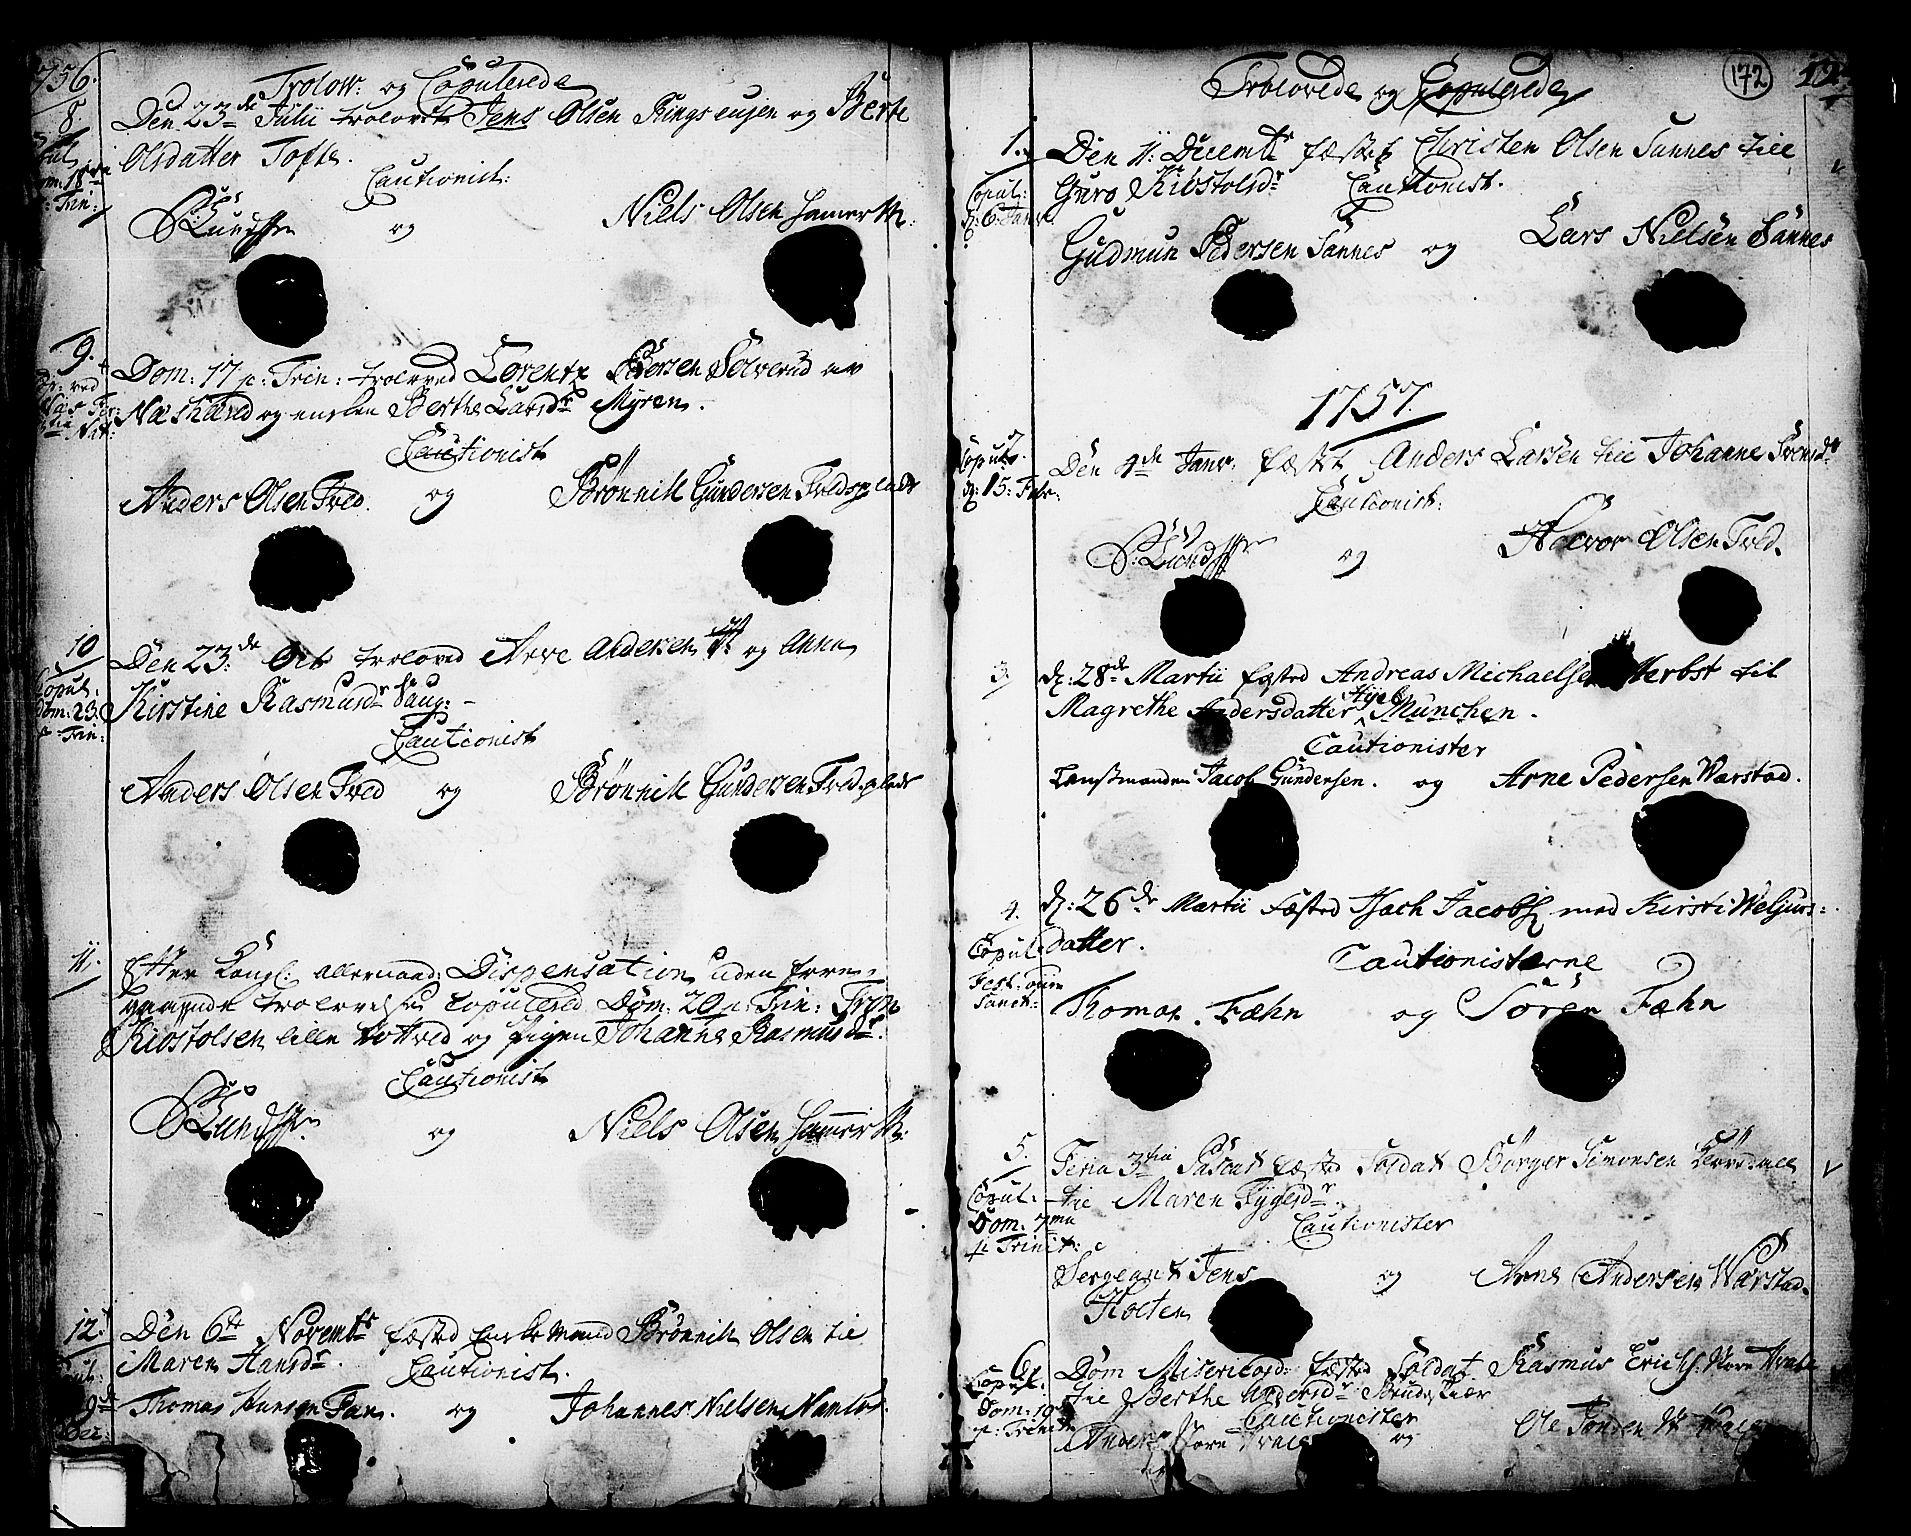 SAKO, Holla kirkebøker, F/Fa/L0001: Ministerialbok nr. 1, 1717-1779, s. 172